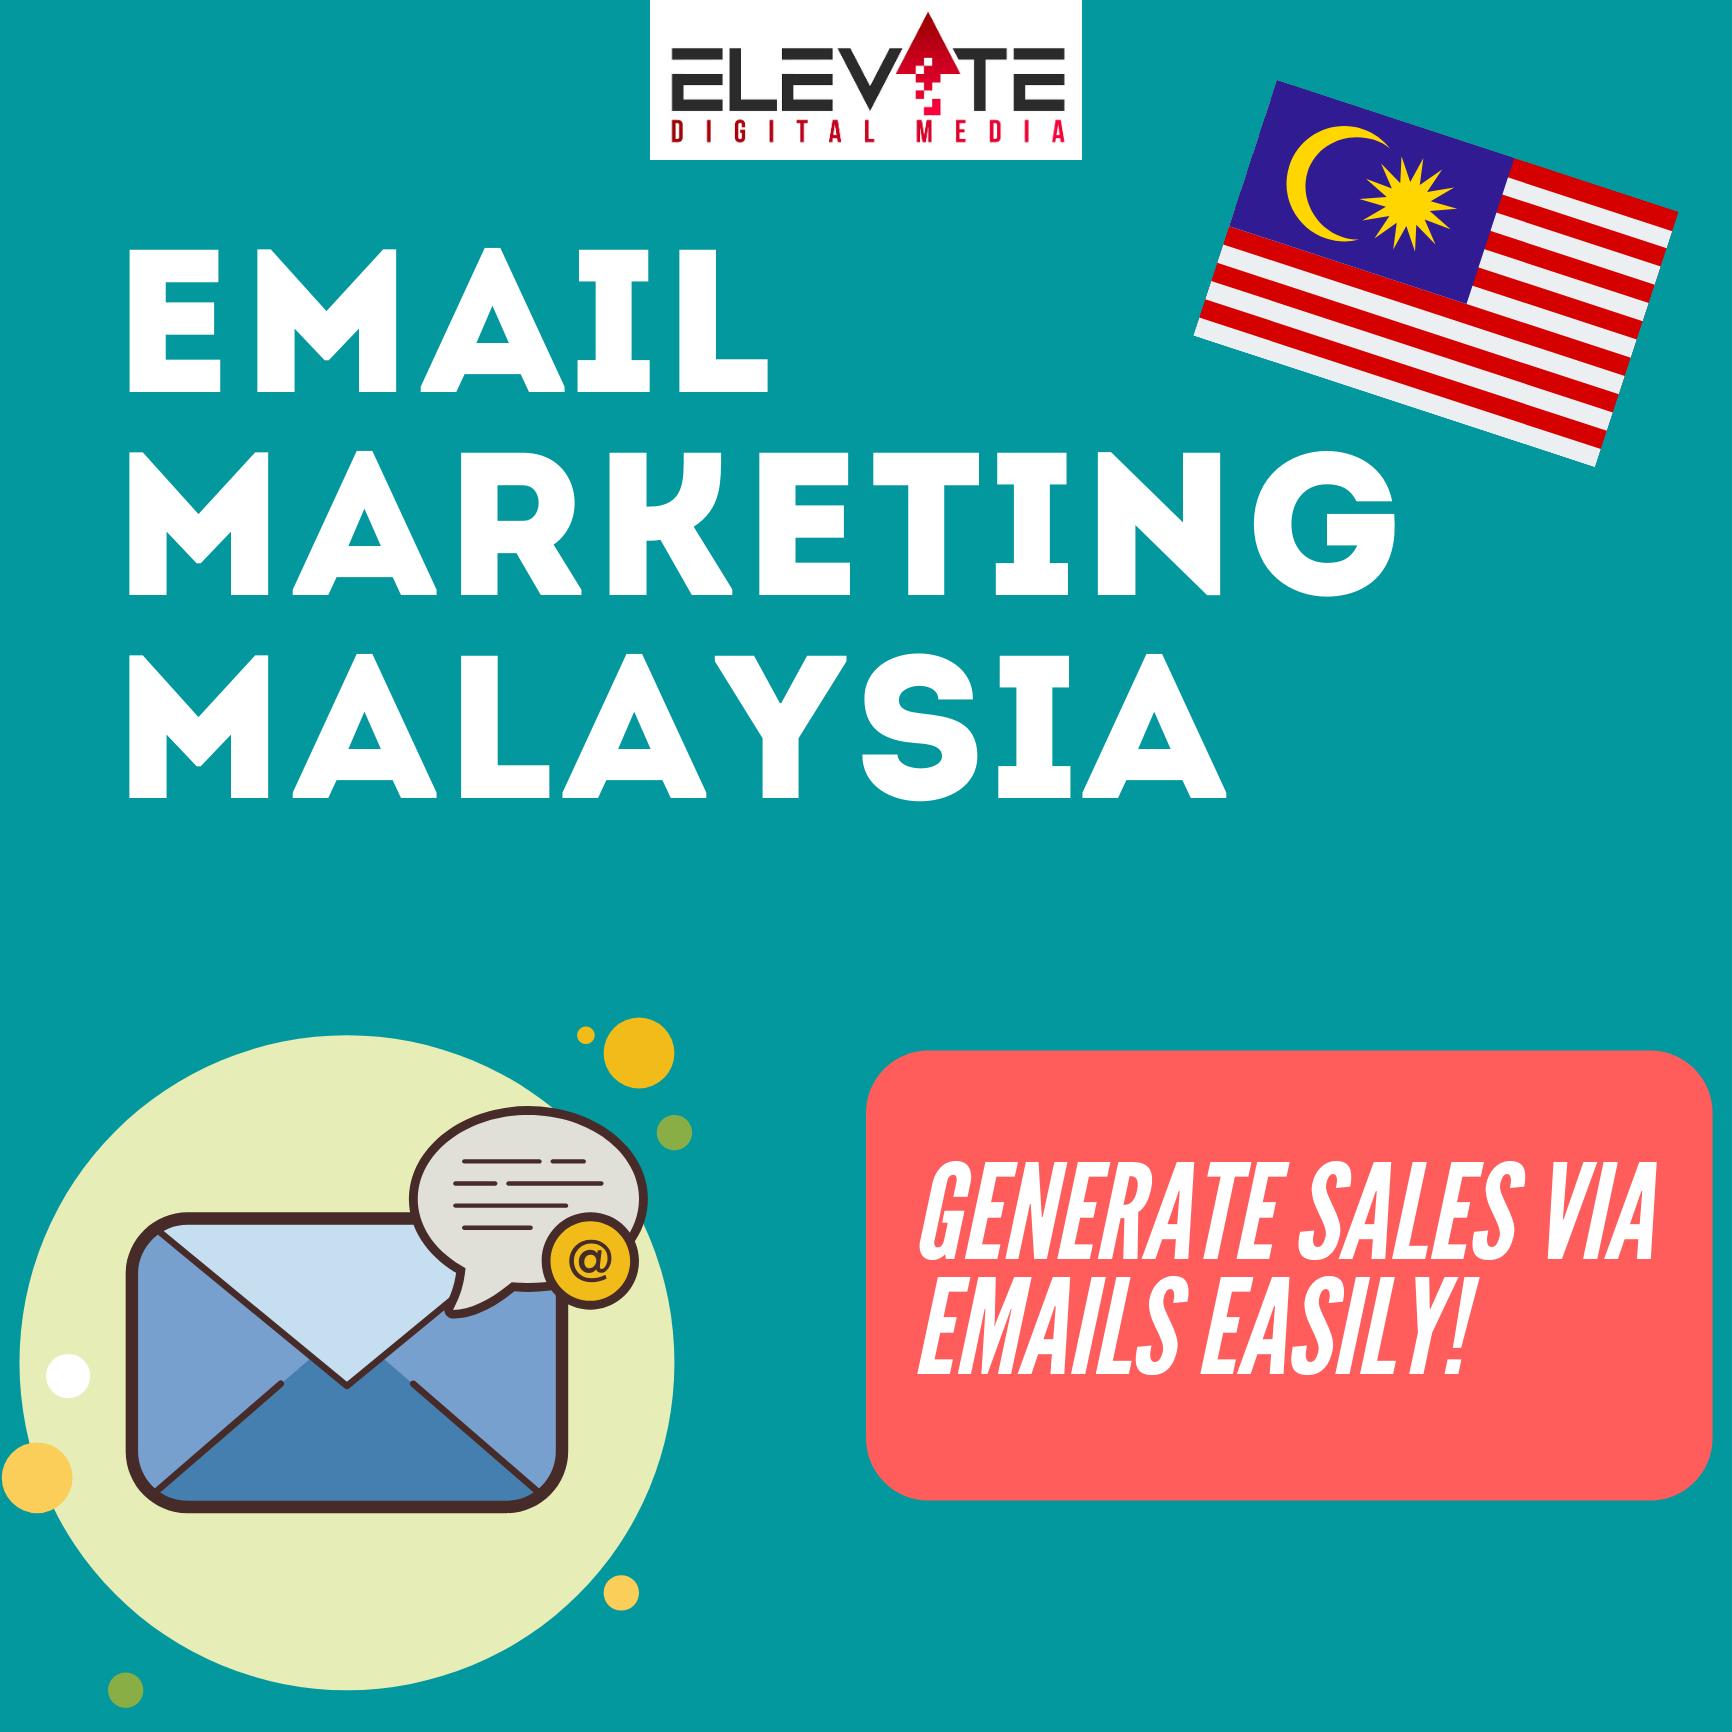 Email Marketing Malaysia